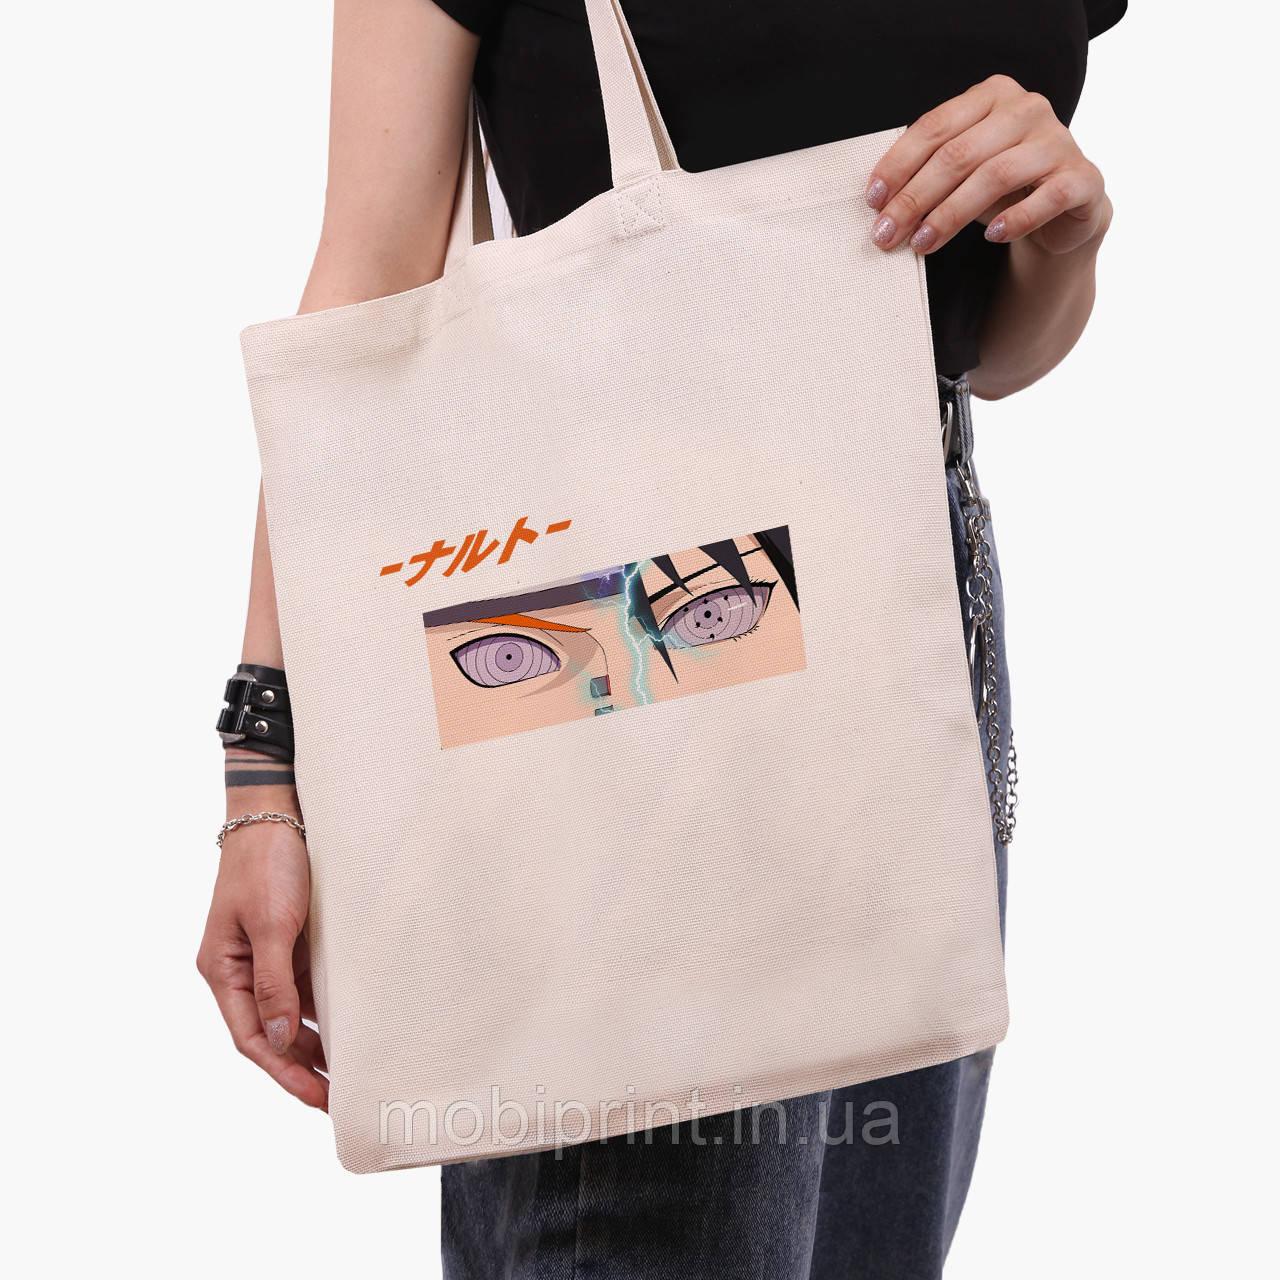 Эко сумка шоппер Наруто Узумаки и Саске Учиха (Naruto Uzumaki and Sasuke Uchiha) (9227-2819)  41*35 см